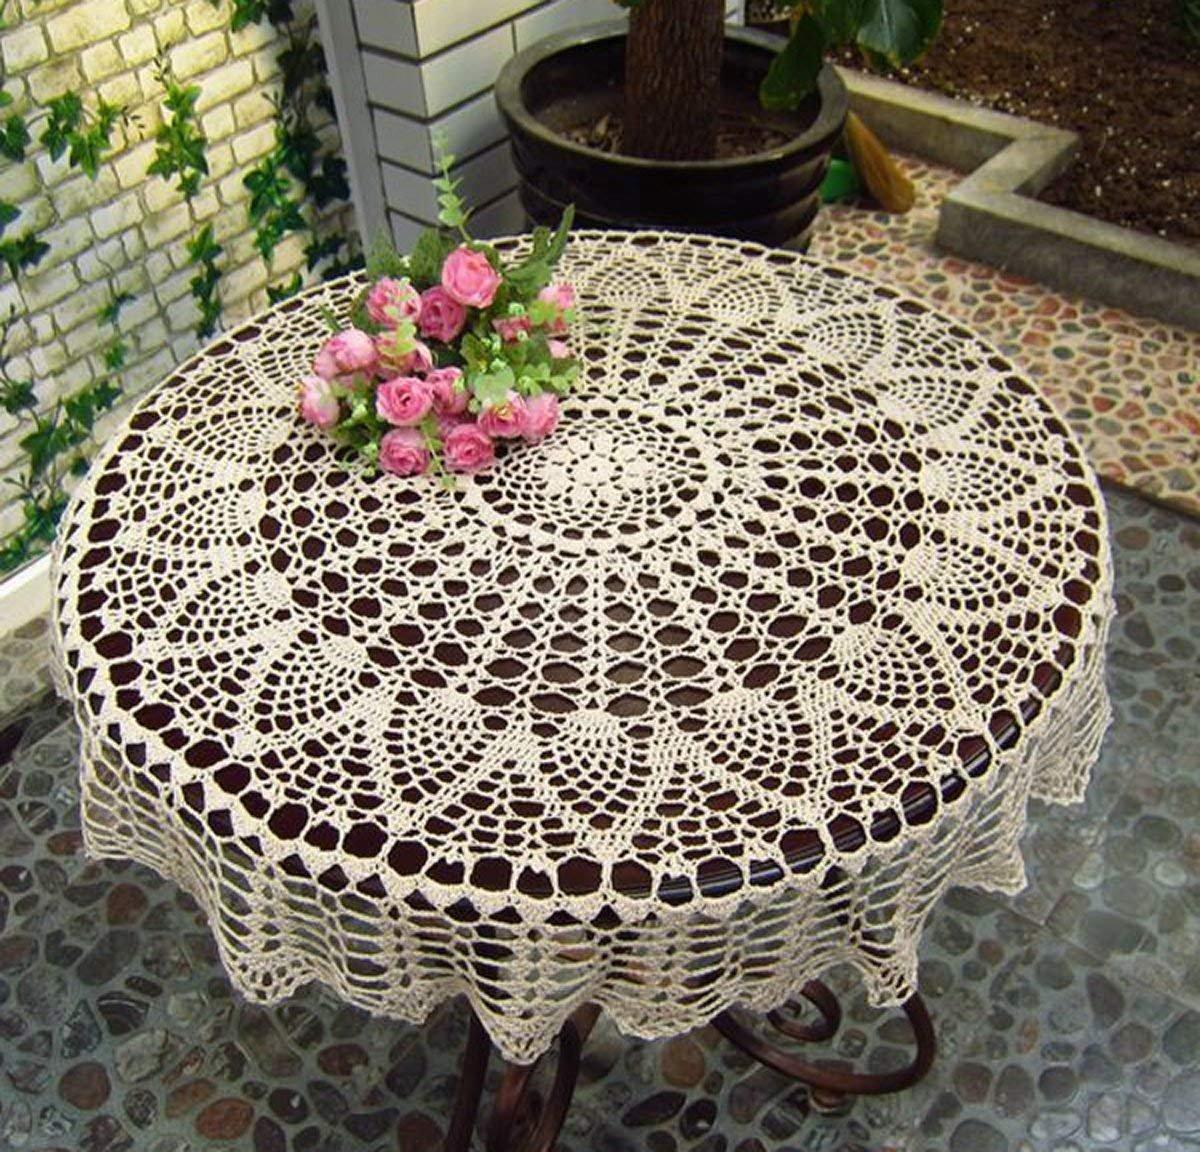 Amazon Ustide Handmade Crochet Cotton Tablecloth Round Beige